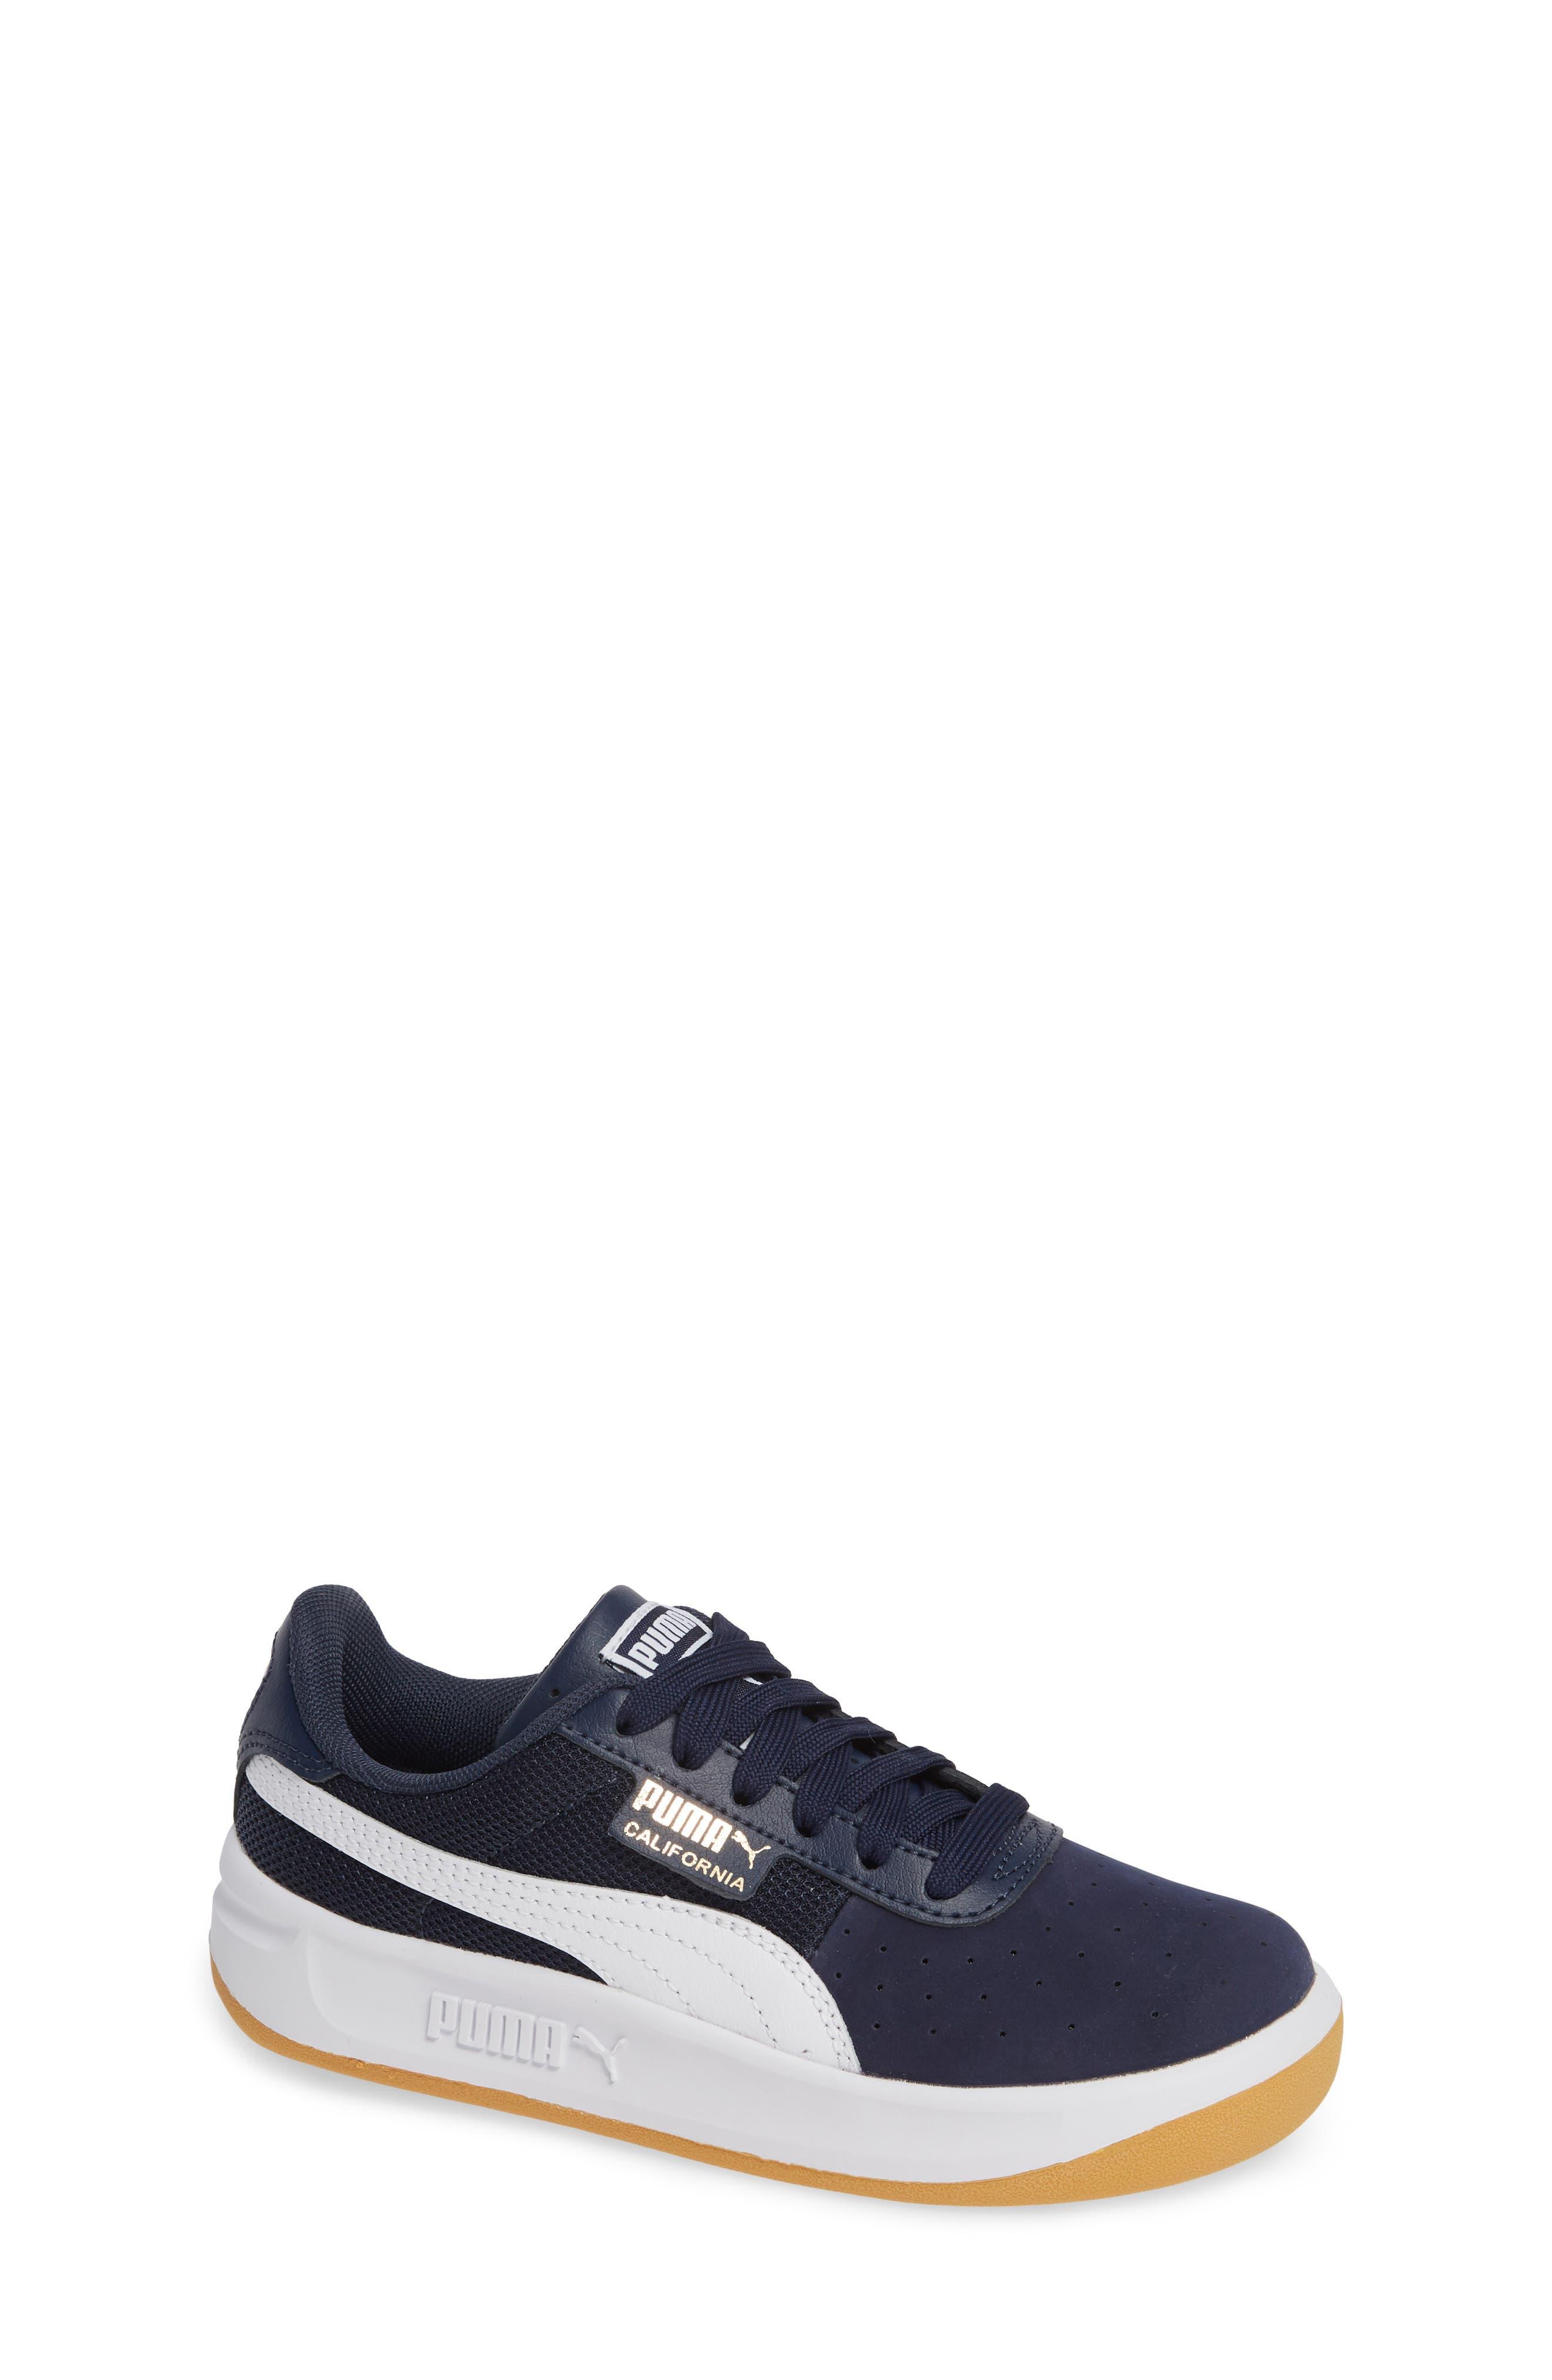 California Casual Jr. Sneaker, Main, color, PEACOAT-PUMA WHITE-GOLD